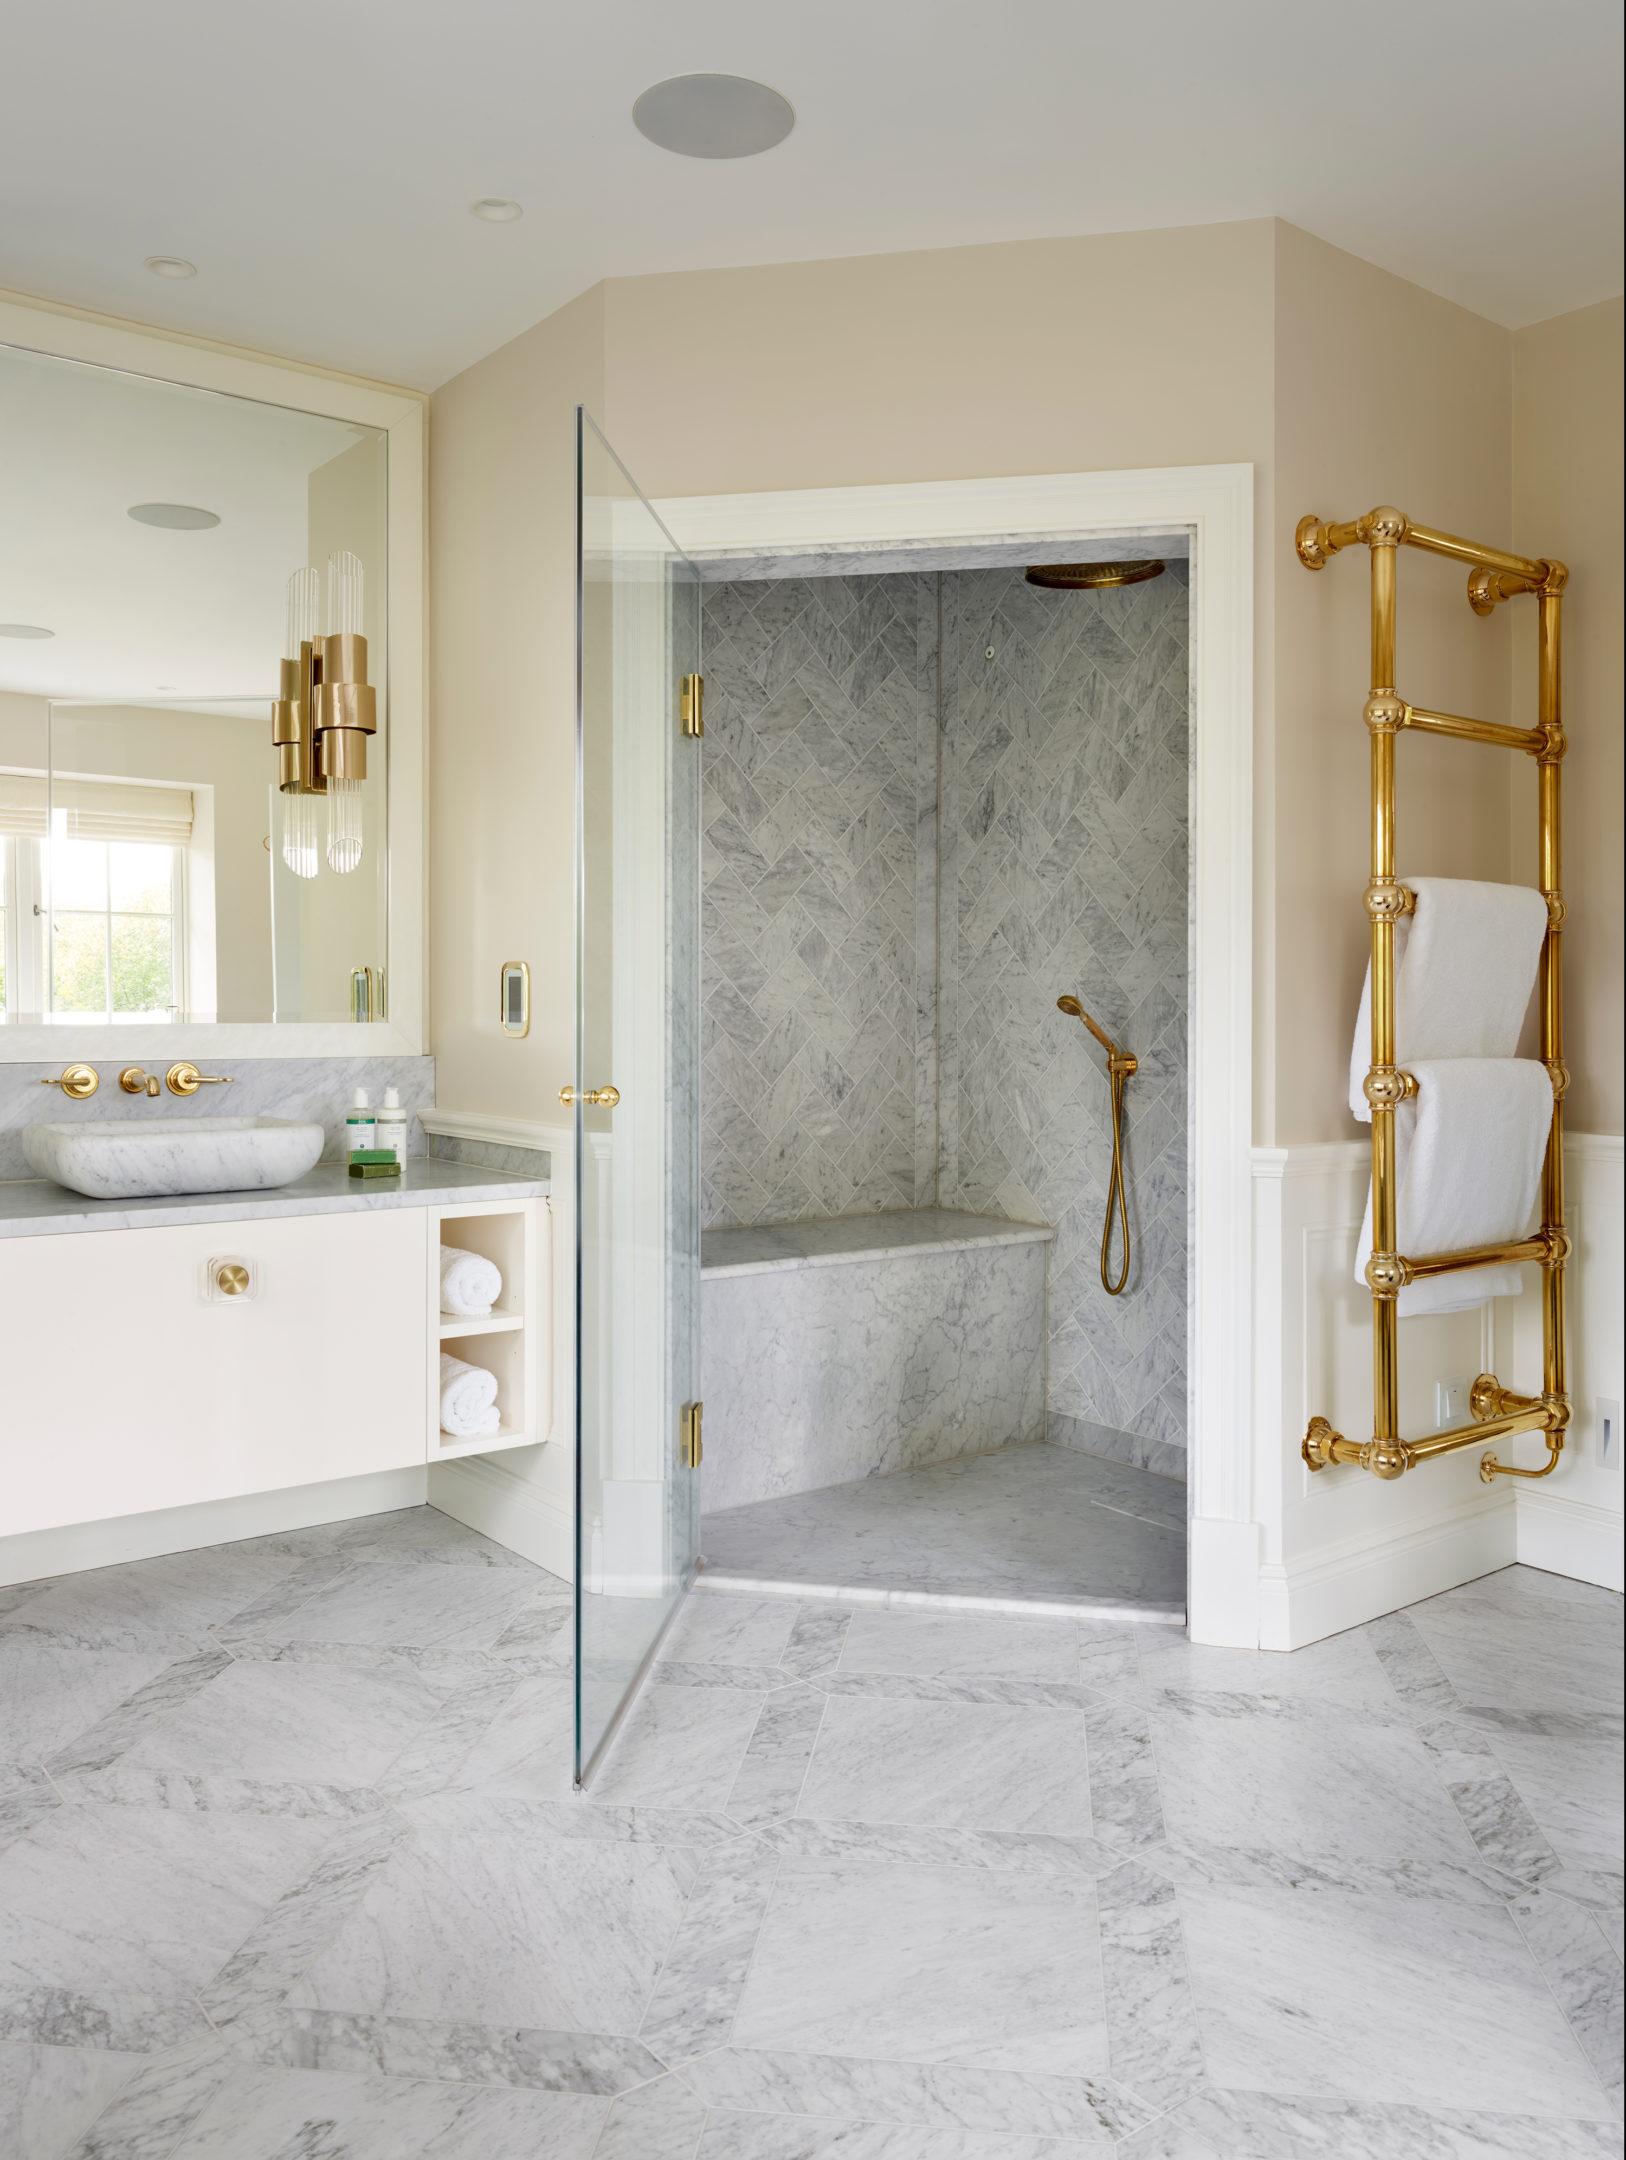 6 Bar Wall Mounted Towel Rail Drummonds Bathrooms